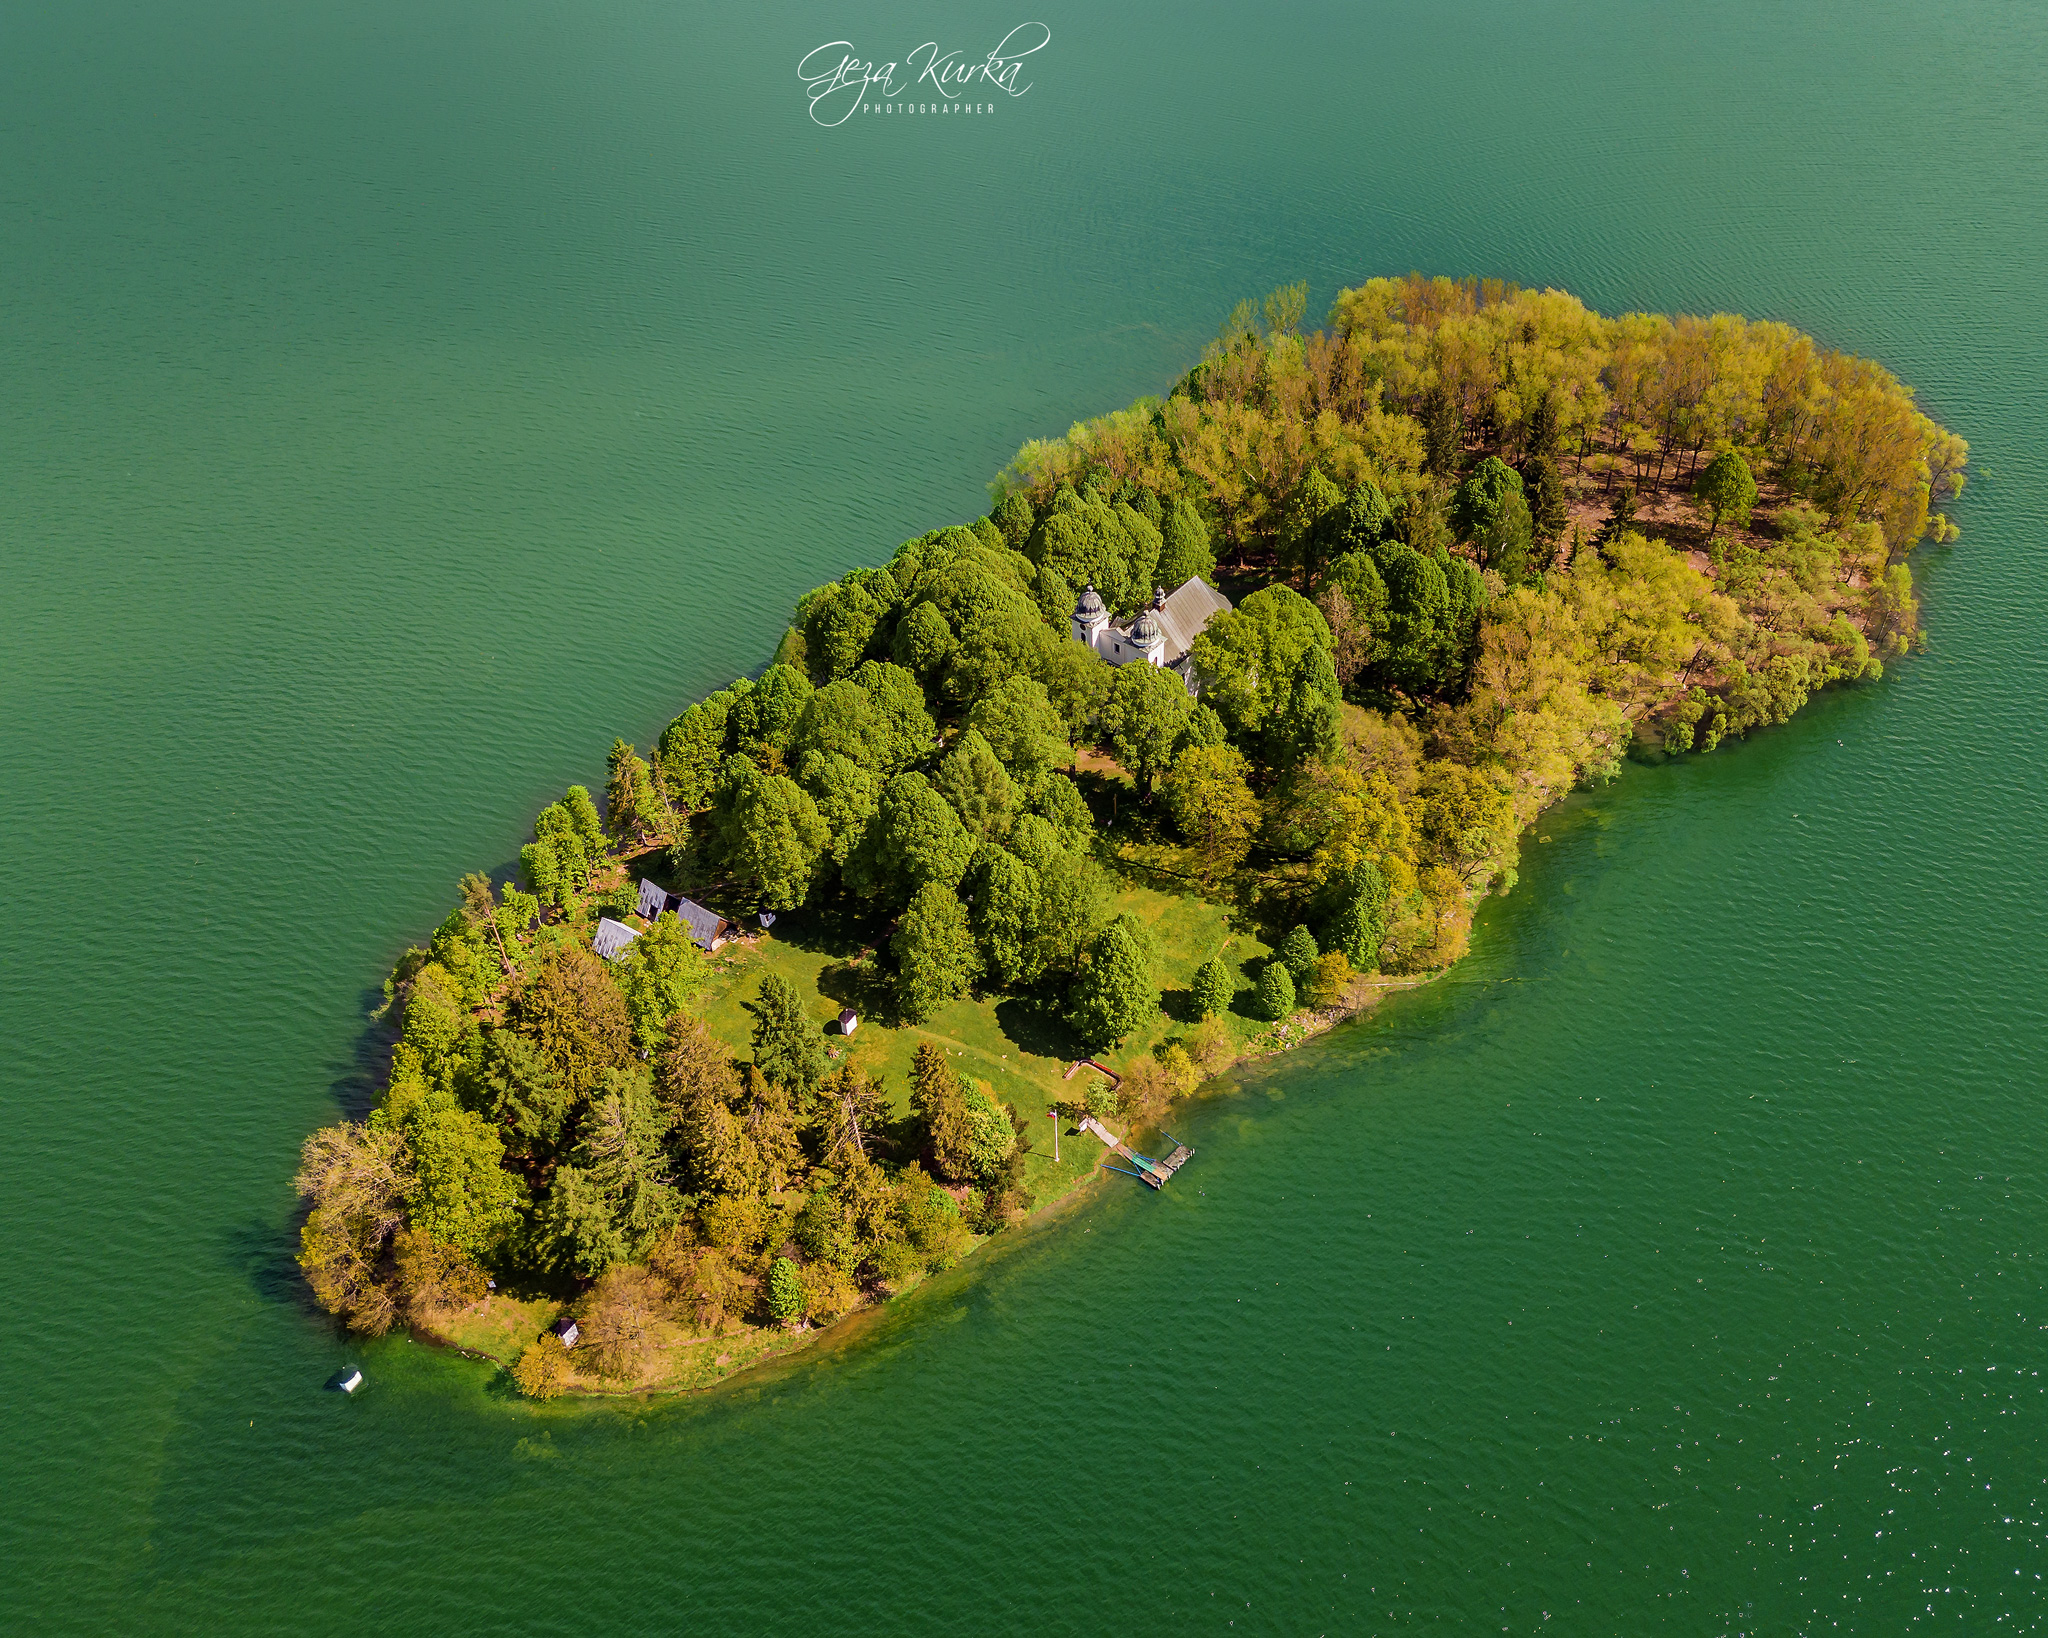 Slanica island of art, Slovakia (Slovak Republic)